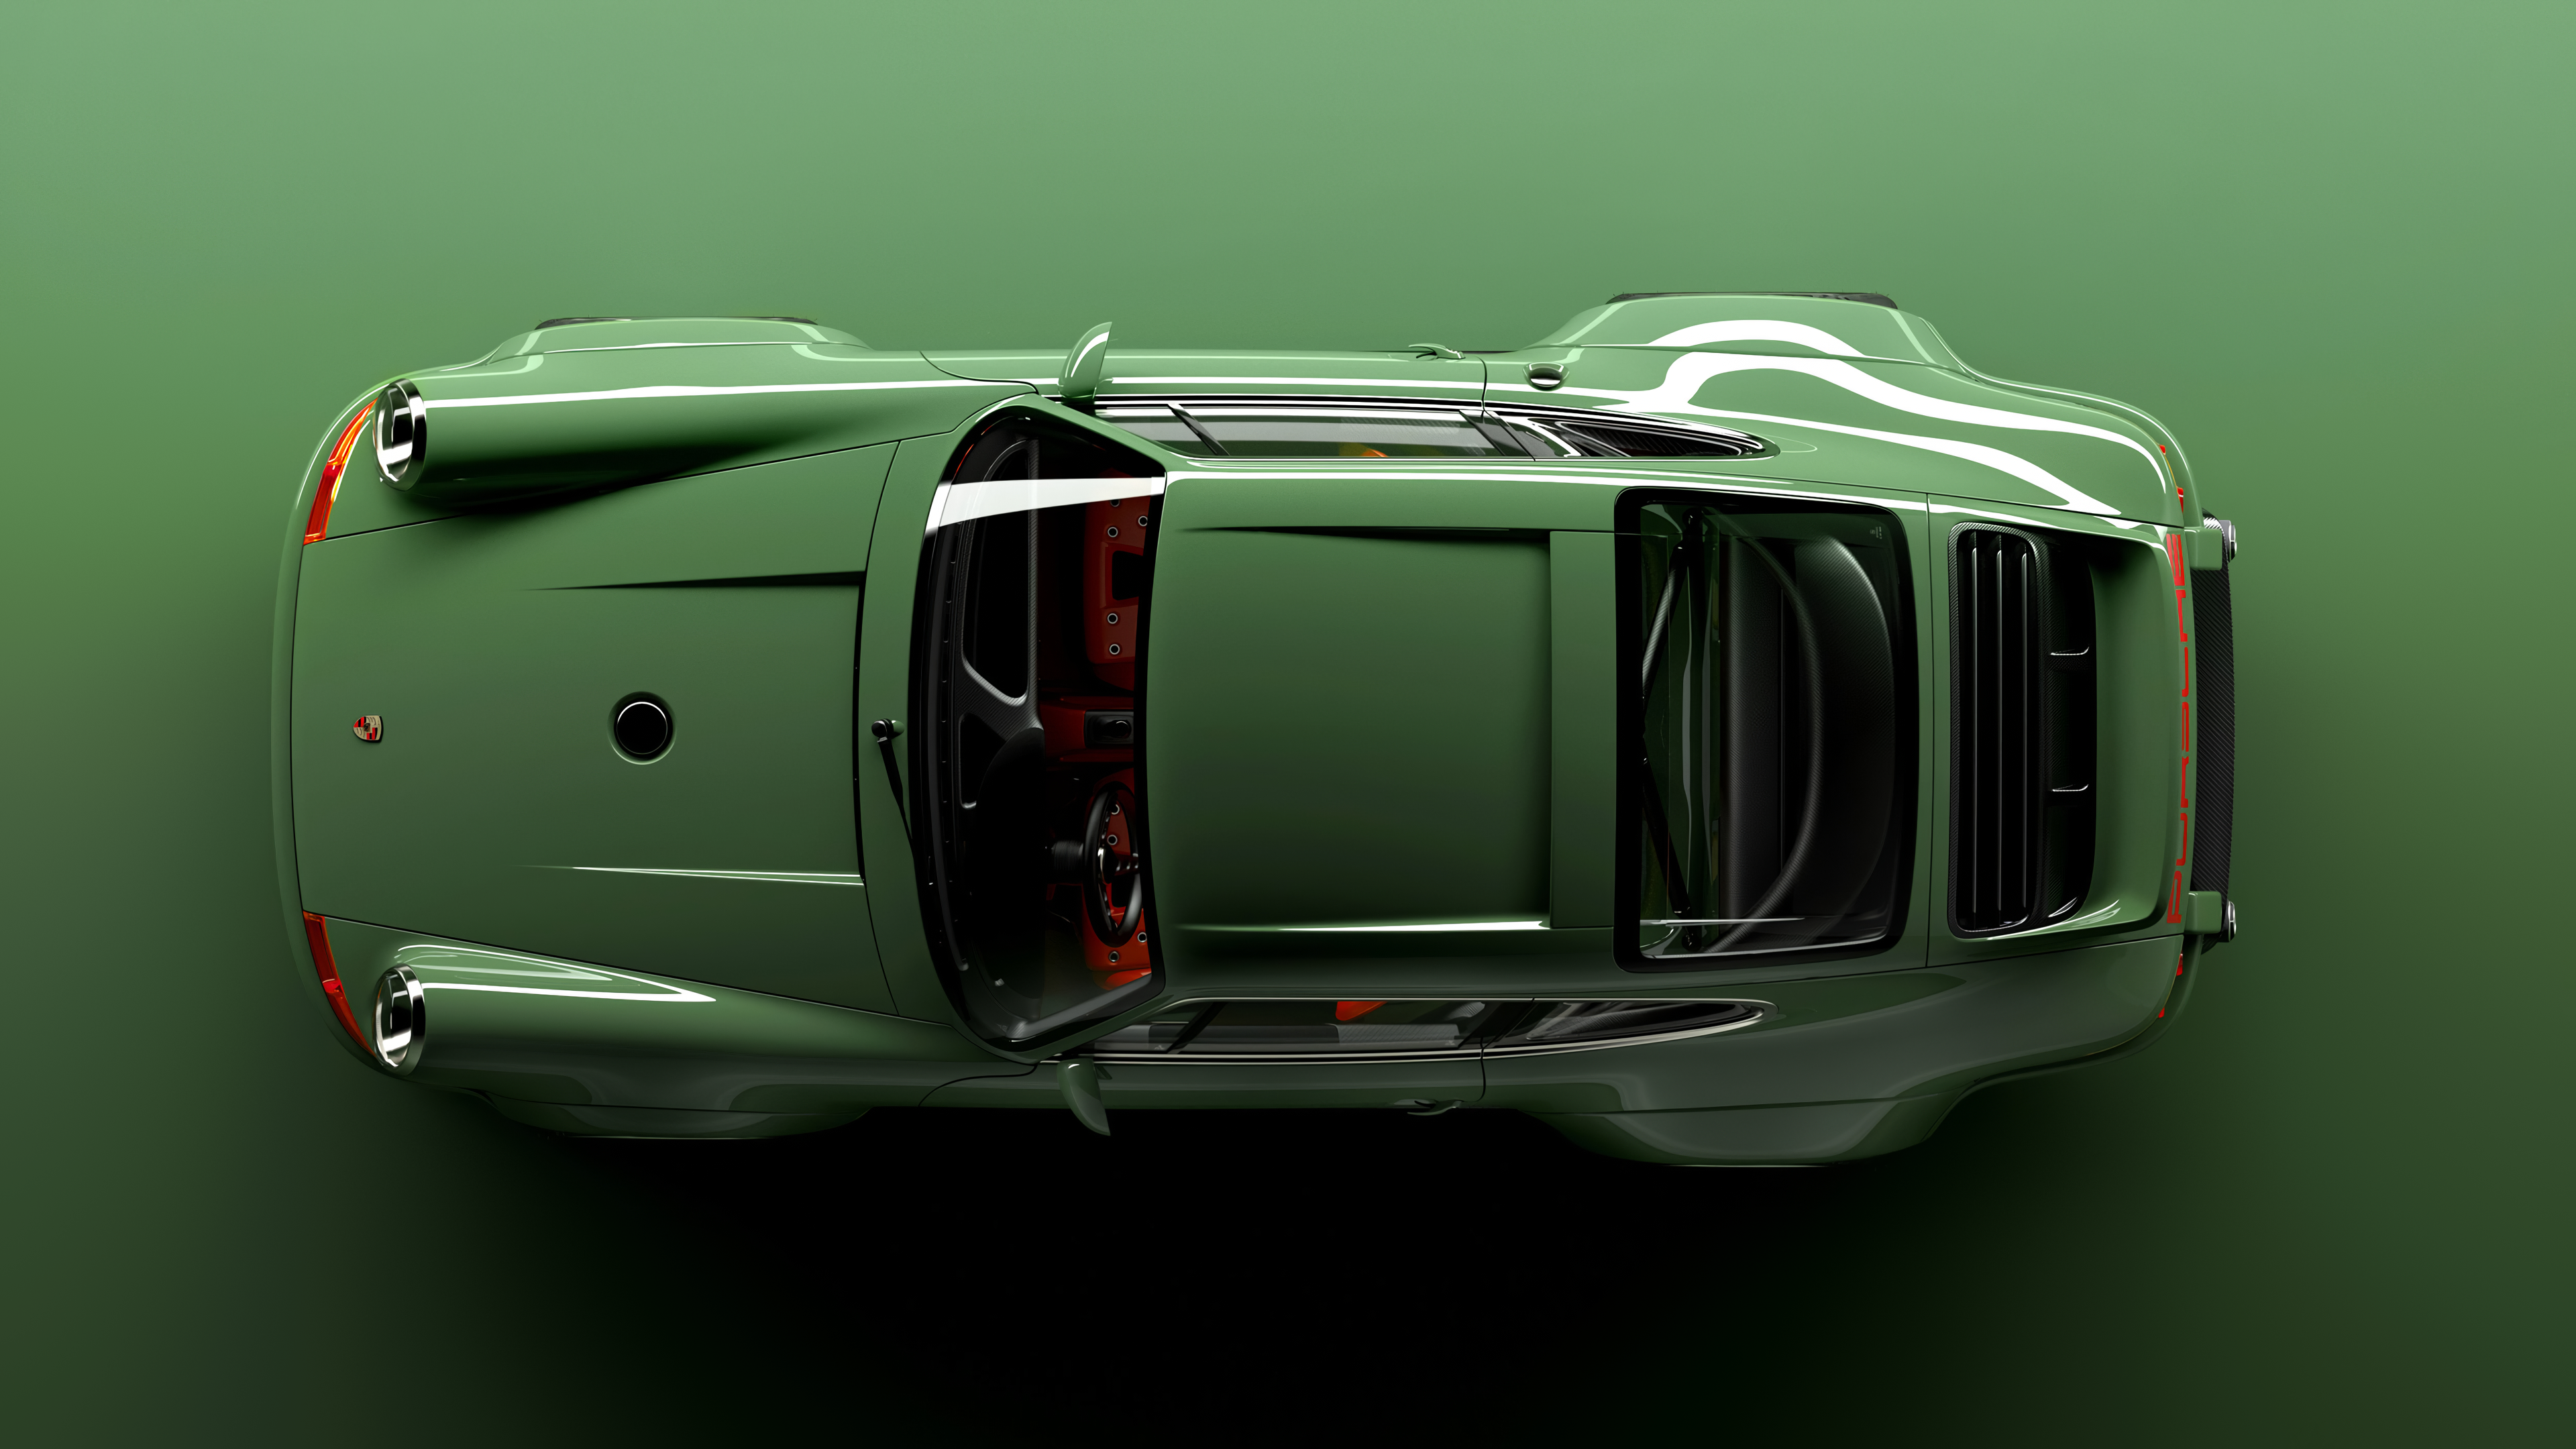 General 3840x2160 Porsche top view car vehicle green cars Porsche 911 Carrera